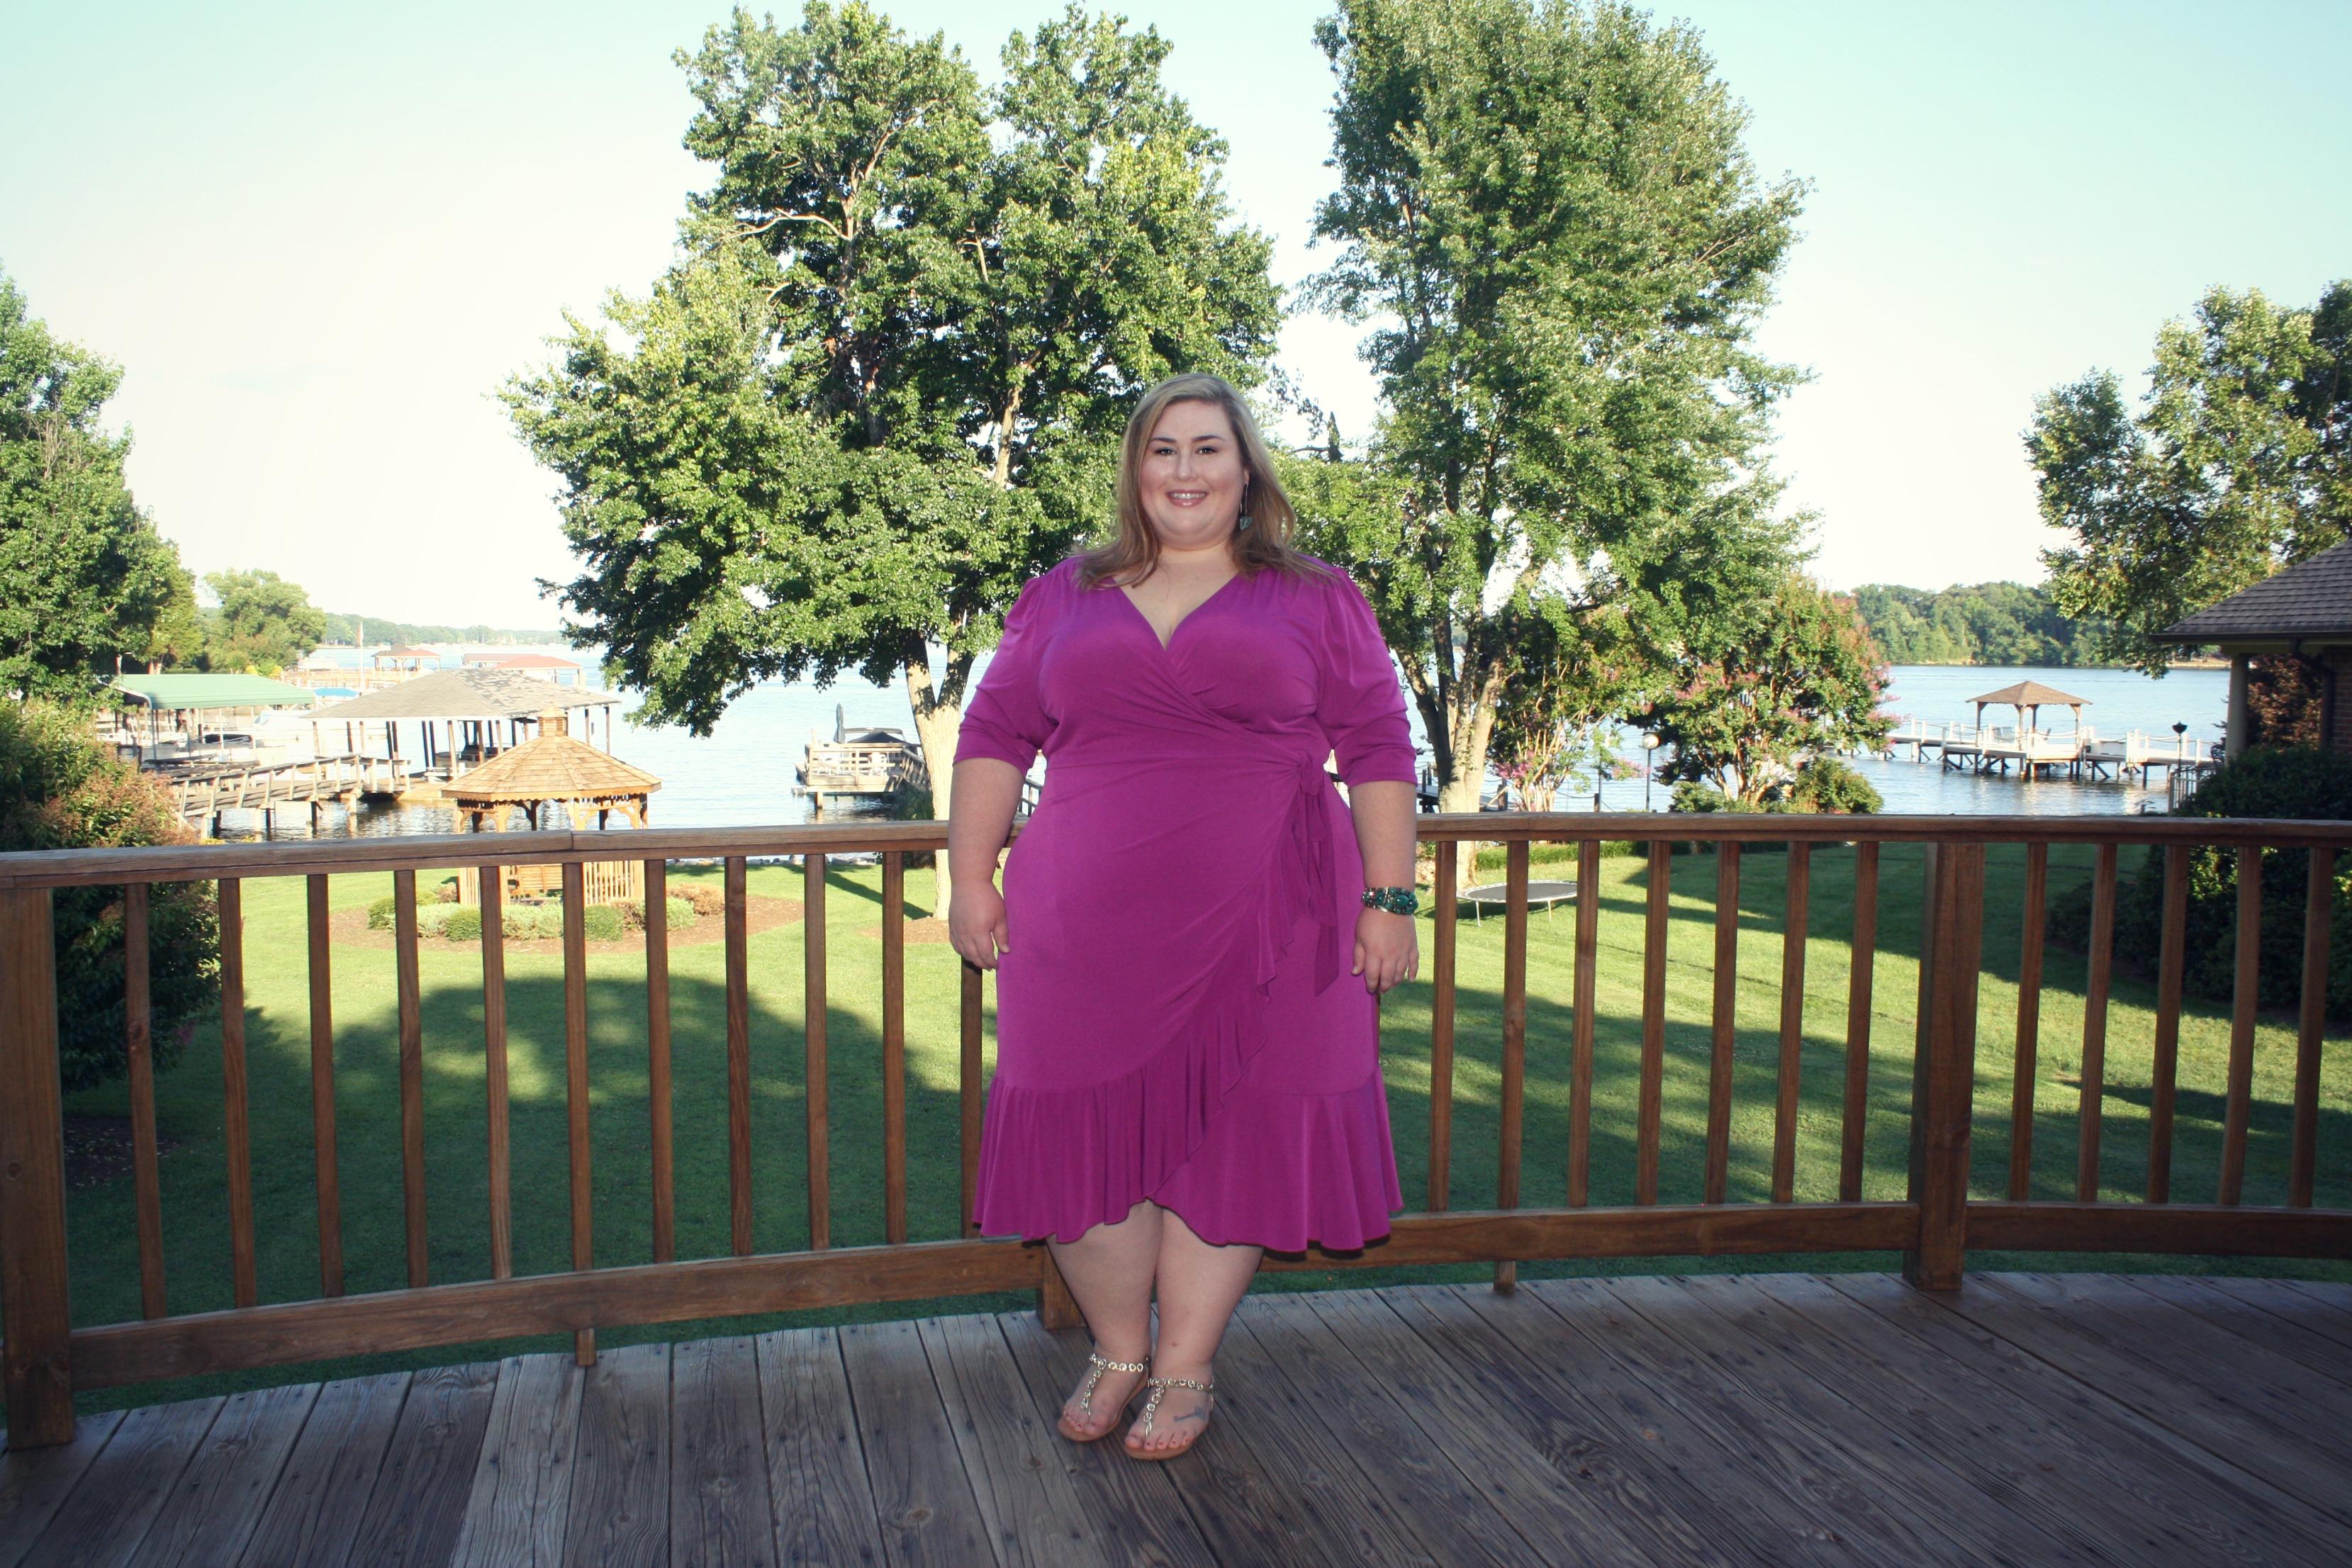 Denisa bbw dress